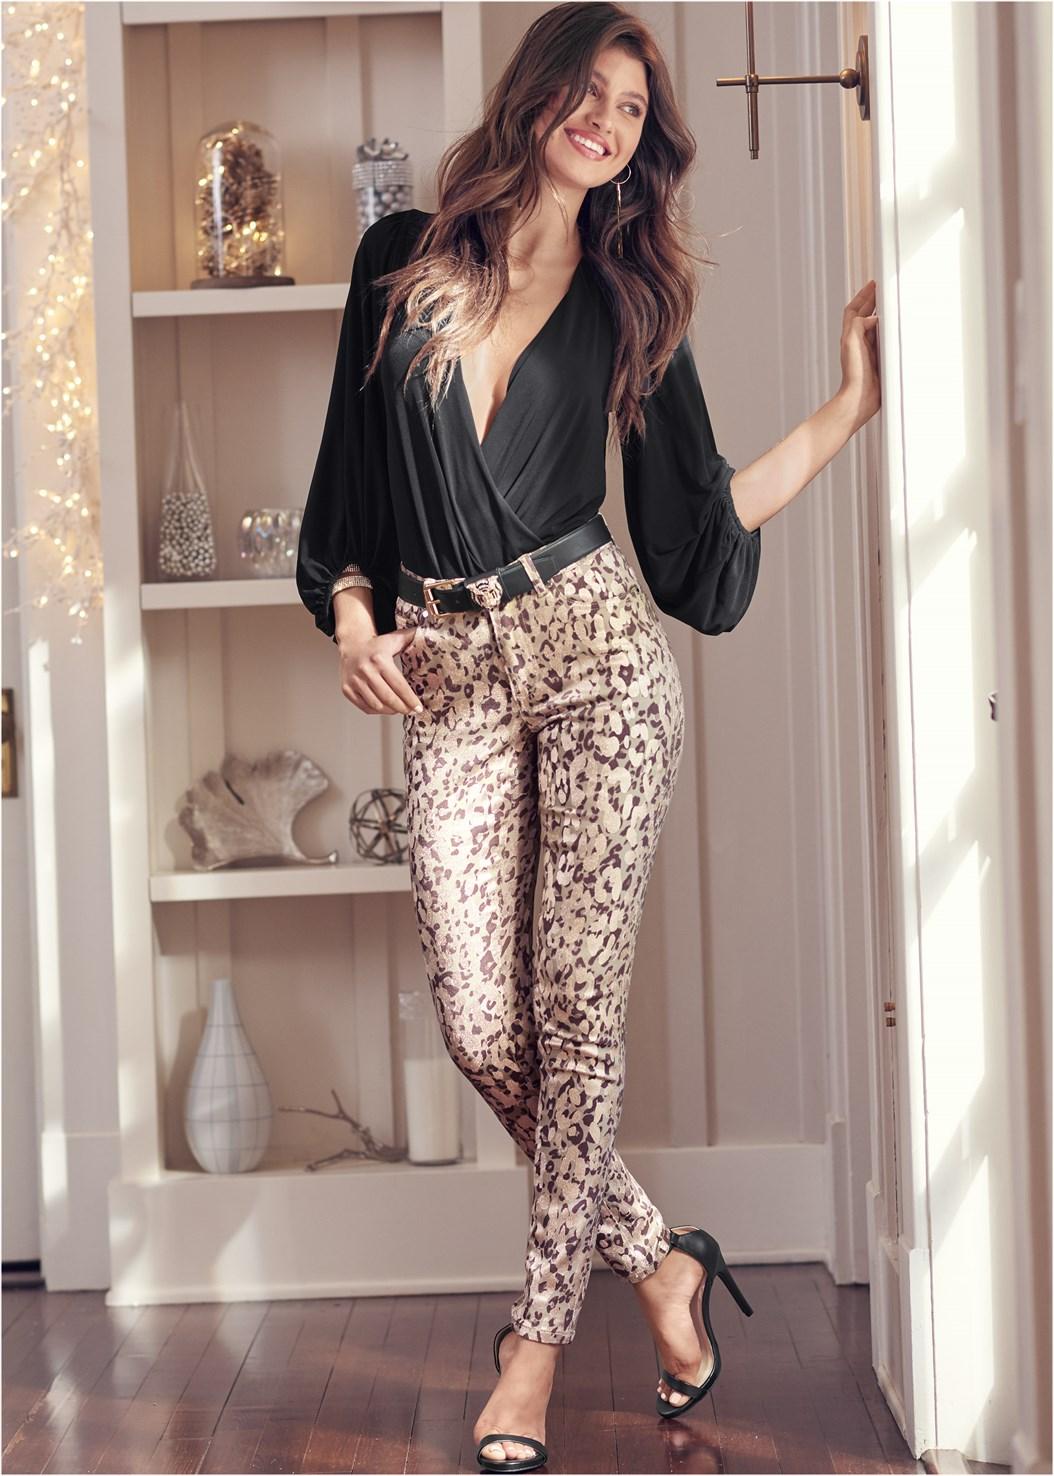 Leopard Print Skinny Jeans,Surplice Bodysuit,Ribbed Mesh Seamless Top,High Heel Strappy Sandals,Ankle Strap Heels,Embellished Fringe Earrings,Tiger Rhinestone Belt